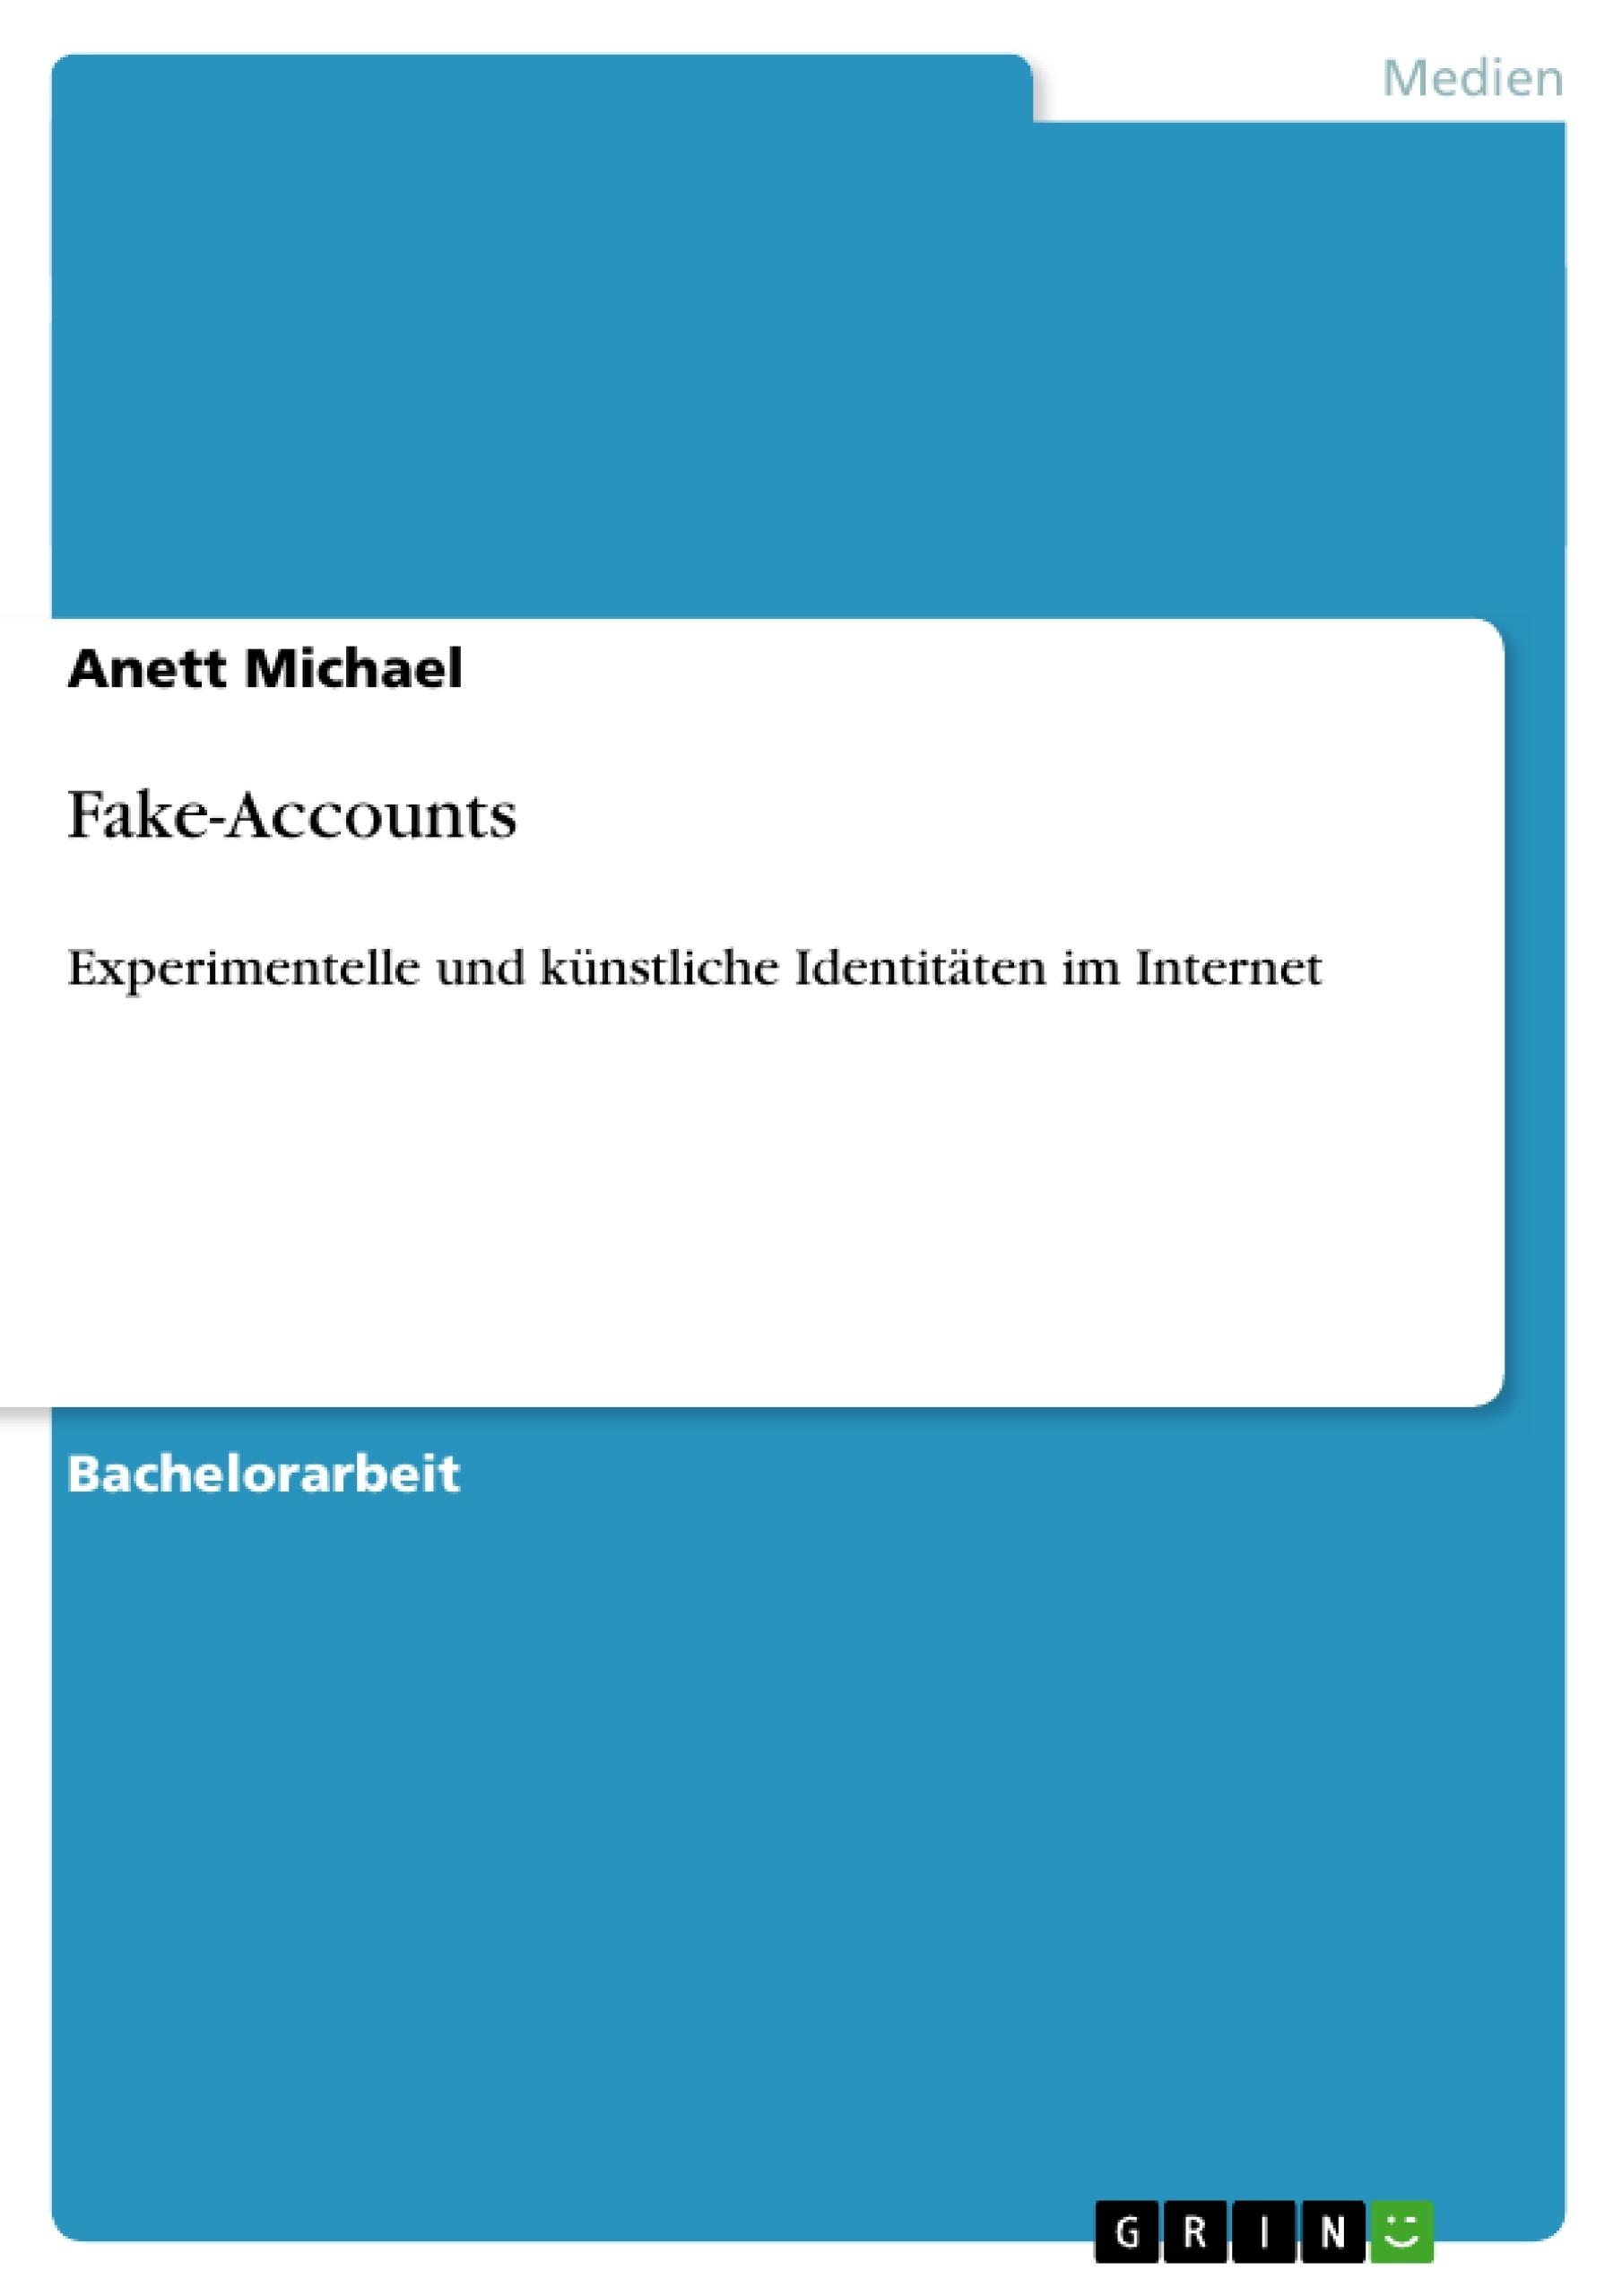 Titel: Fake-Accounts